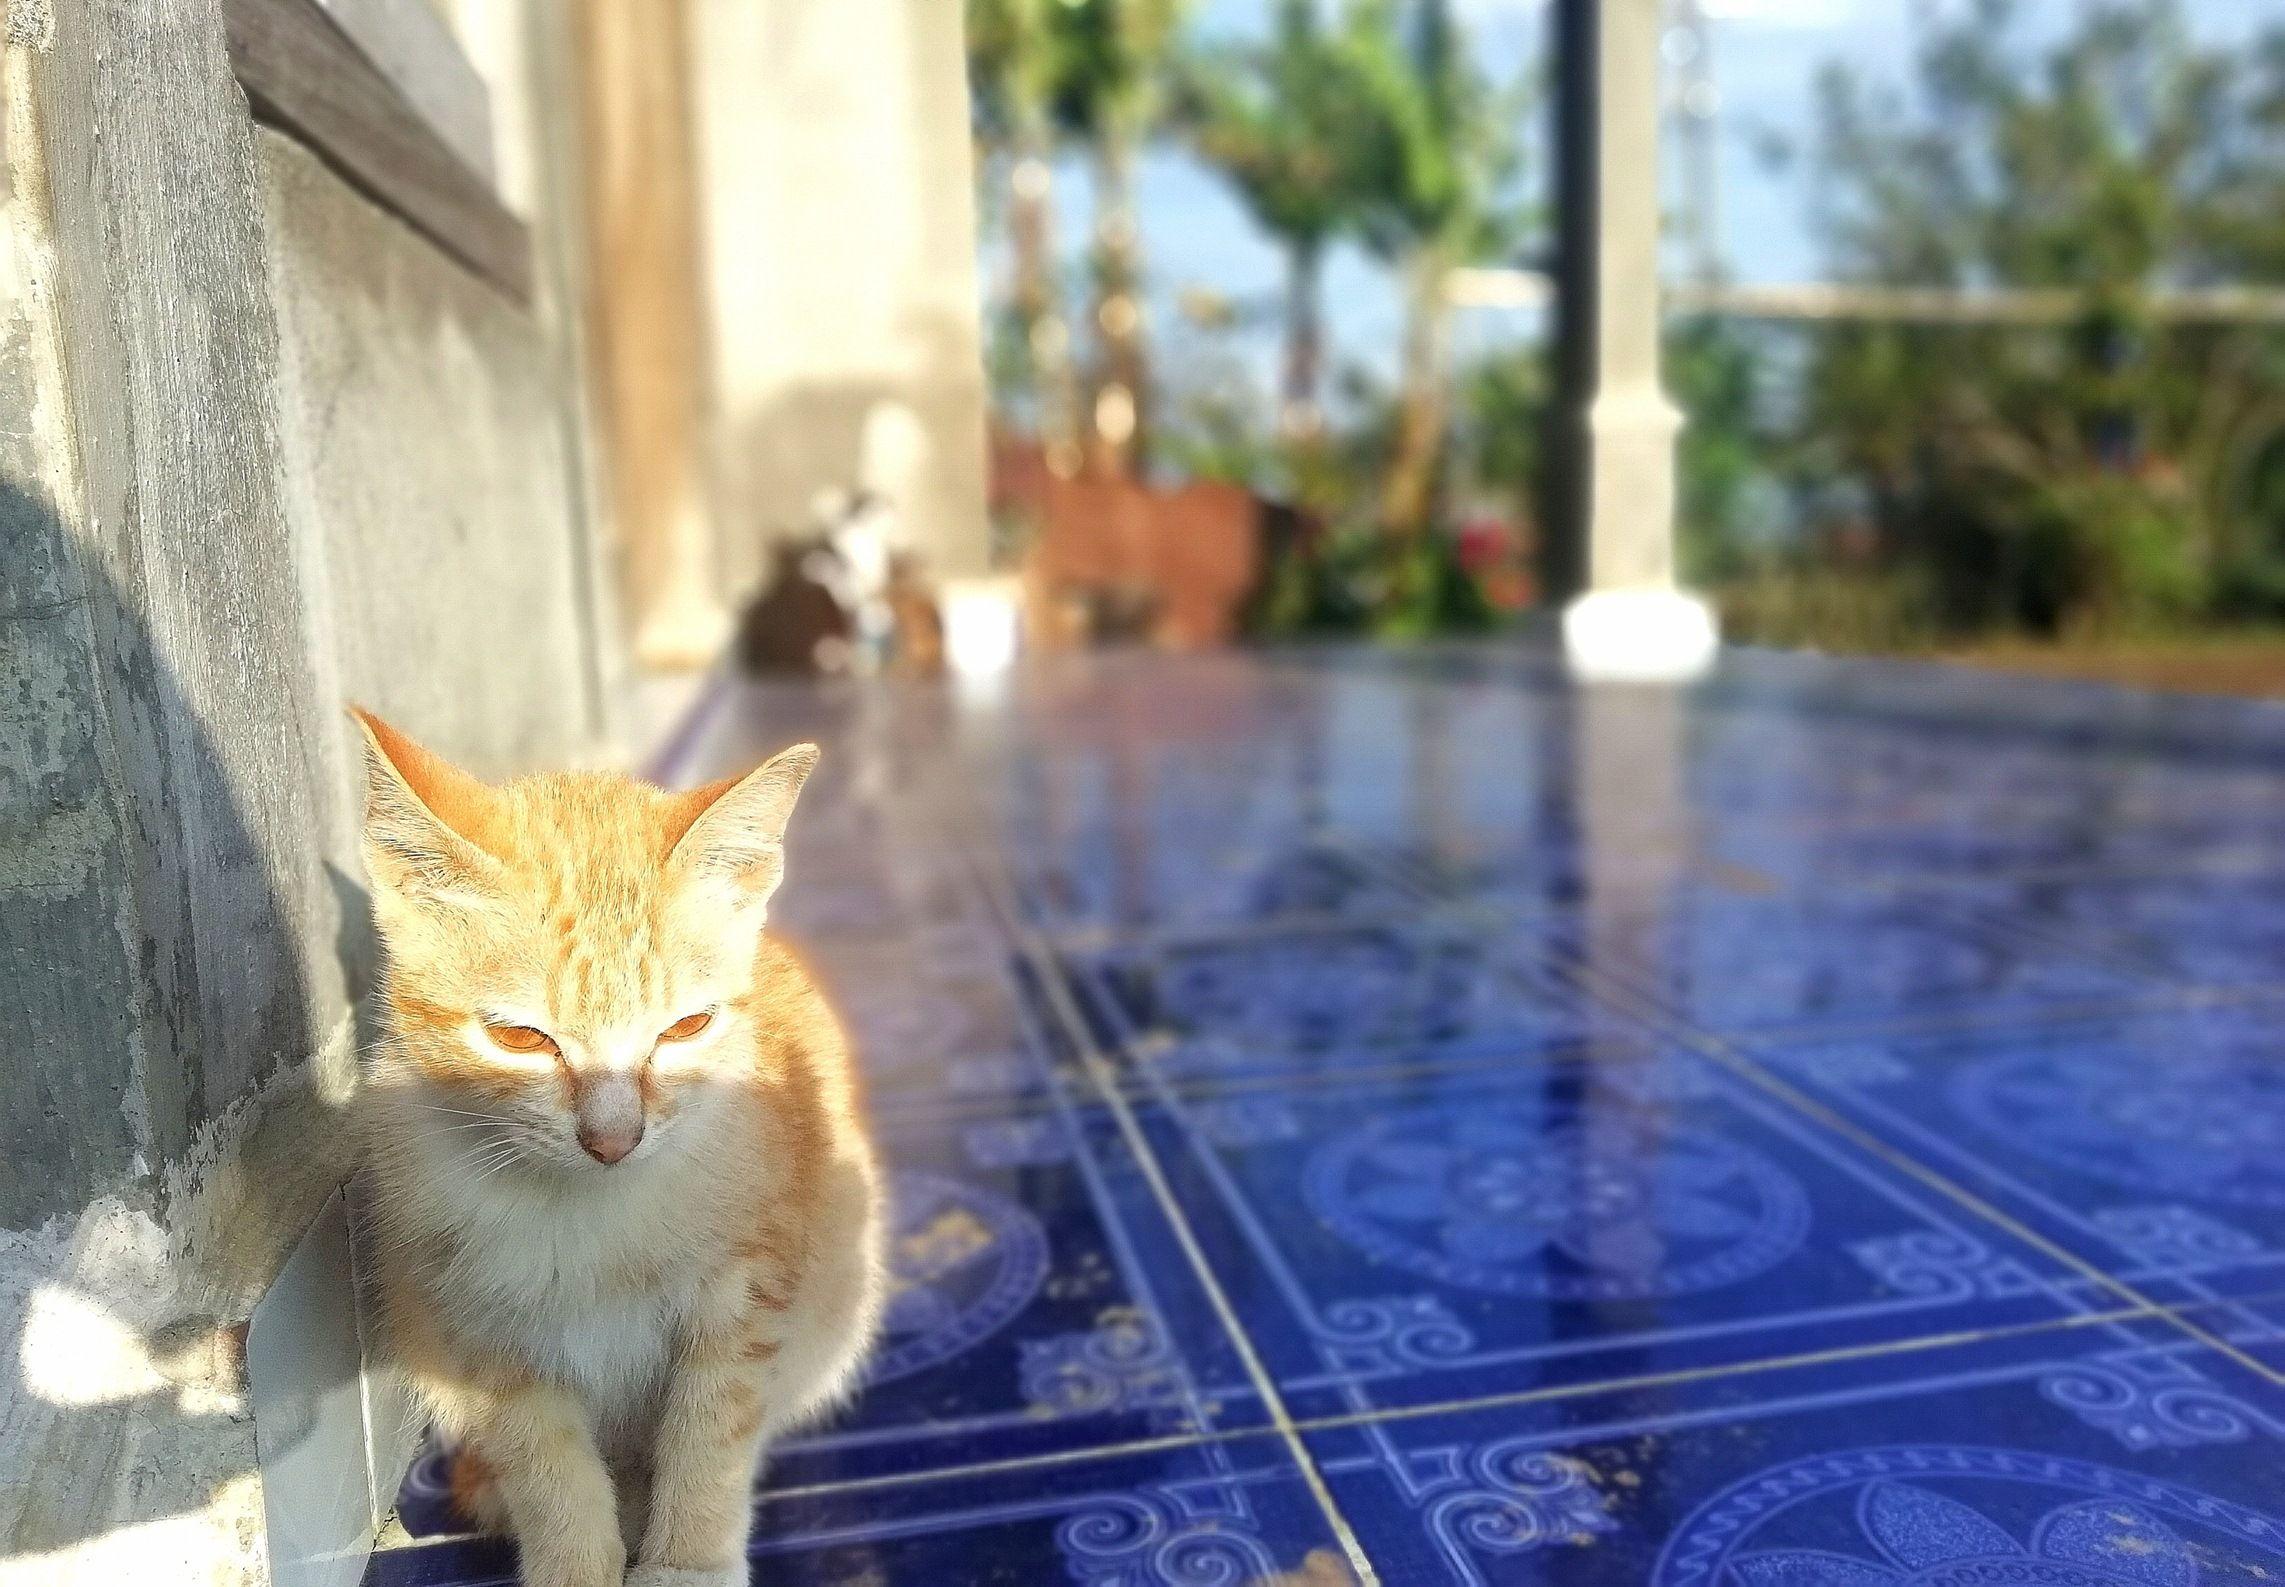 Kami Dan Kucing Kampung Sama Sama Makan Nasi Halaman 1 Kompasiana Com